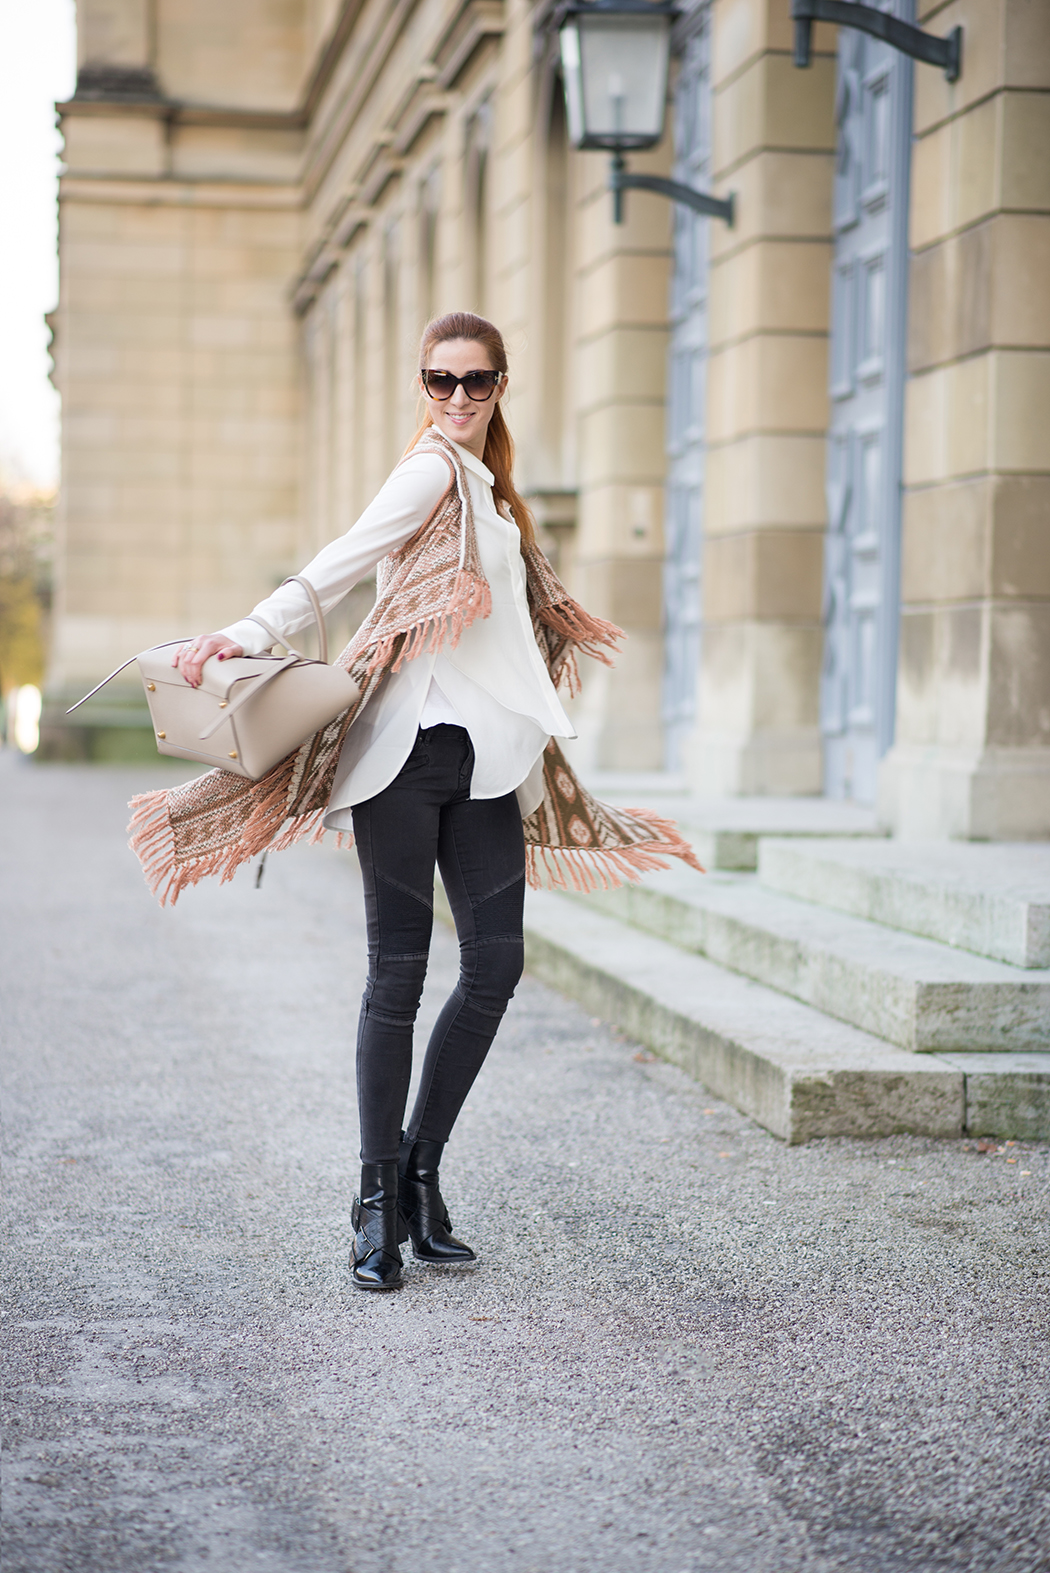 Fashionblog-Fashionblogger-Fashion-Blog-Blogger-Lifestyle-Céline_Belt_Bag-beige-REVIEW-Tom-Ford-Sonnenbrille-Cateye-Lindarella-6-web